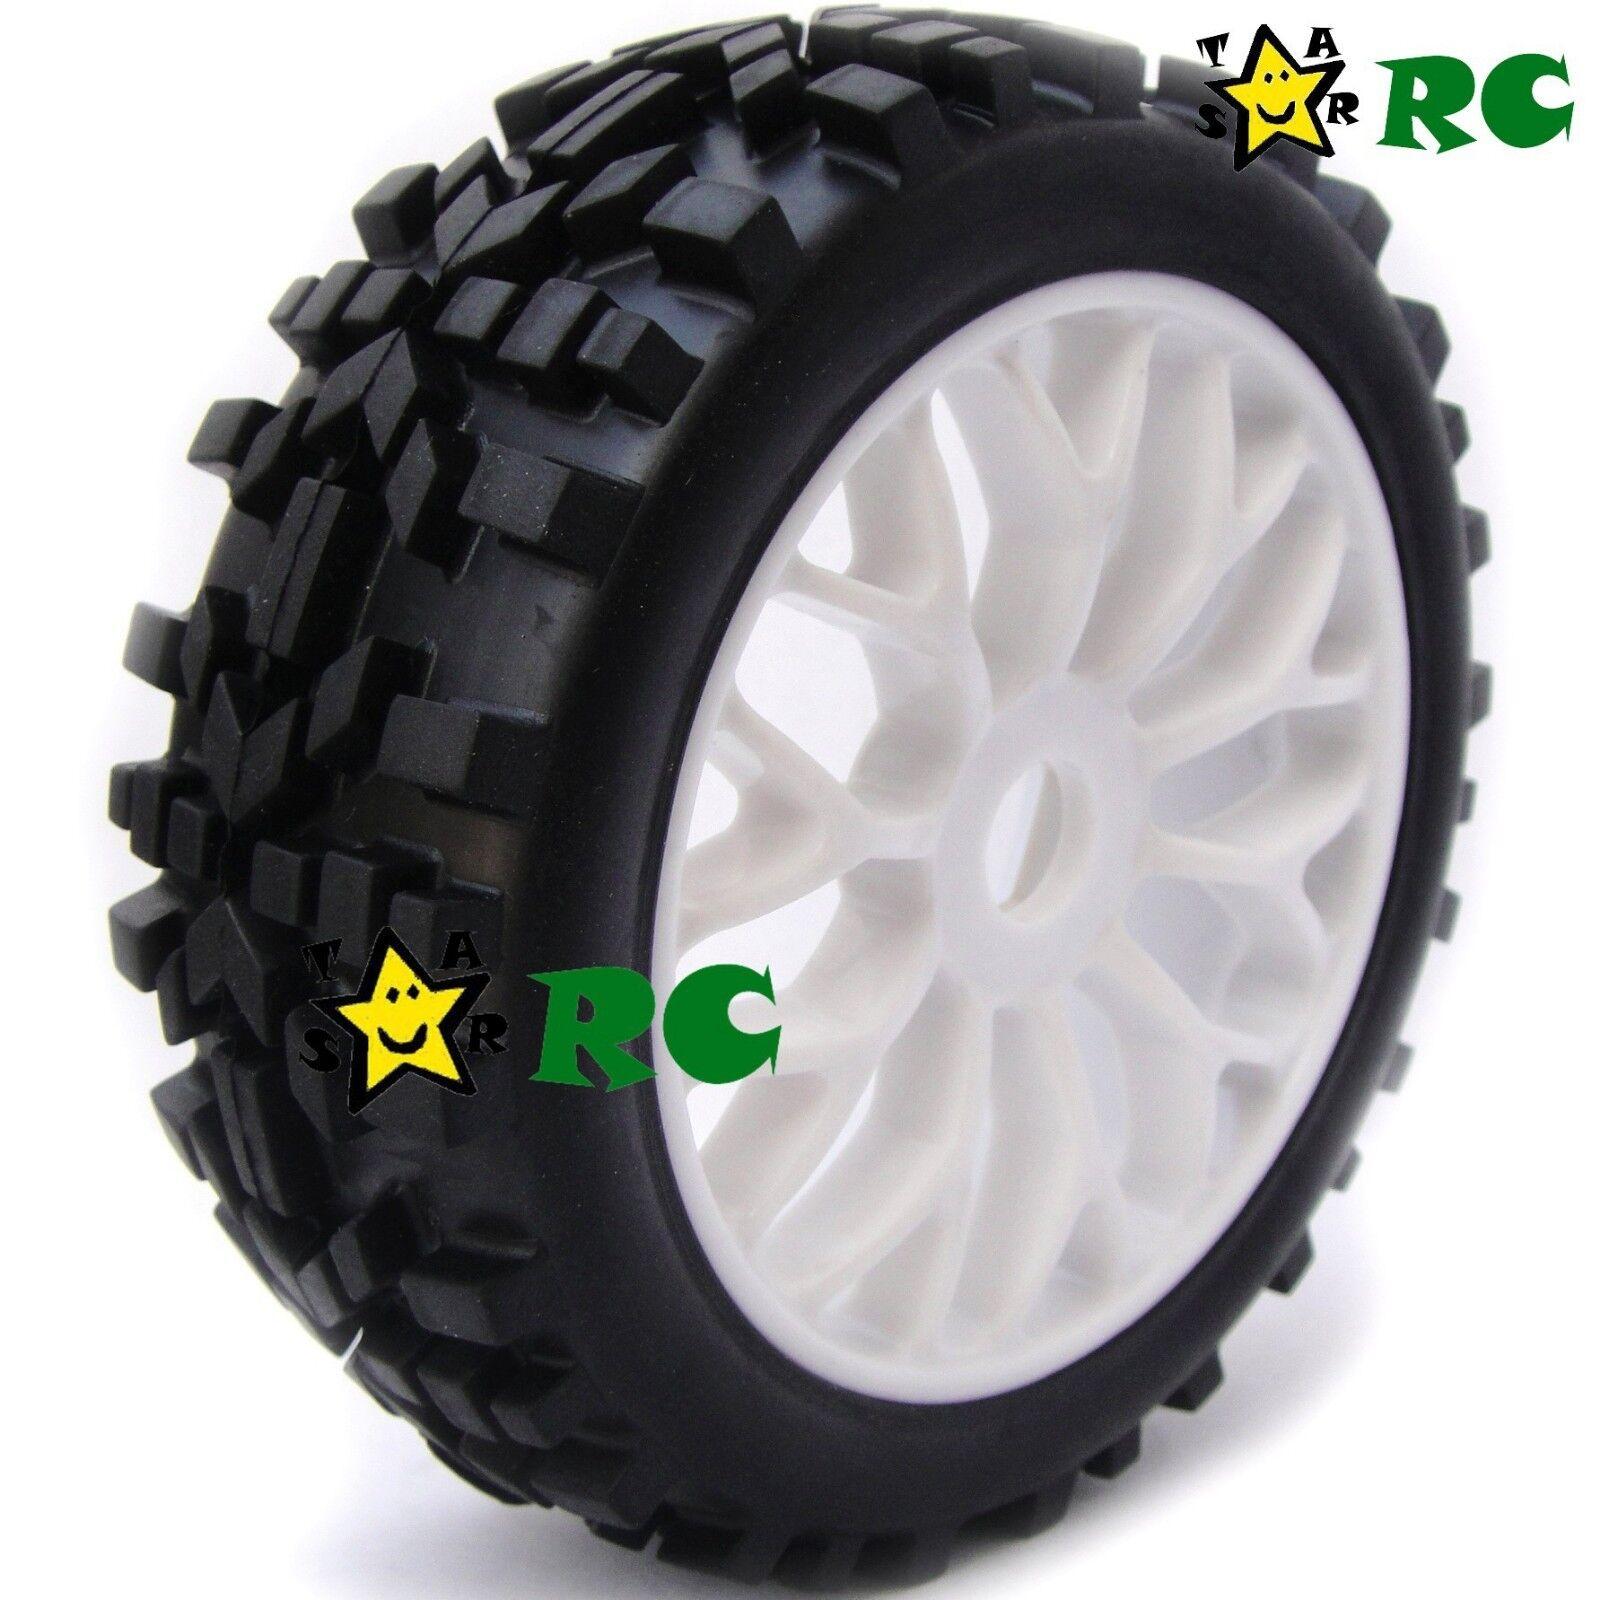 hobbysoul 4pcs 1//8 Off Road Tires Buggy Tyres Hex 17mm Wheels for 1:8 Losi HPI XTR Badlands Cars